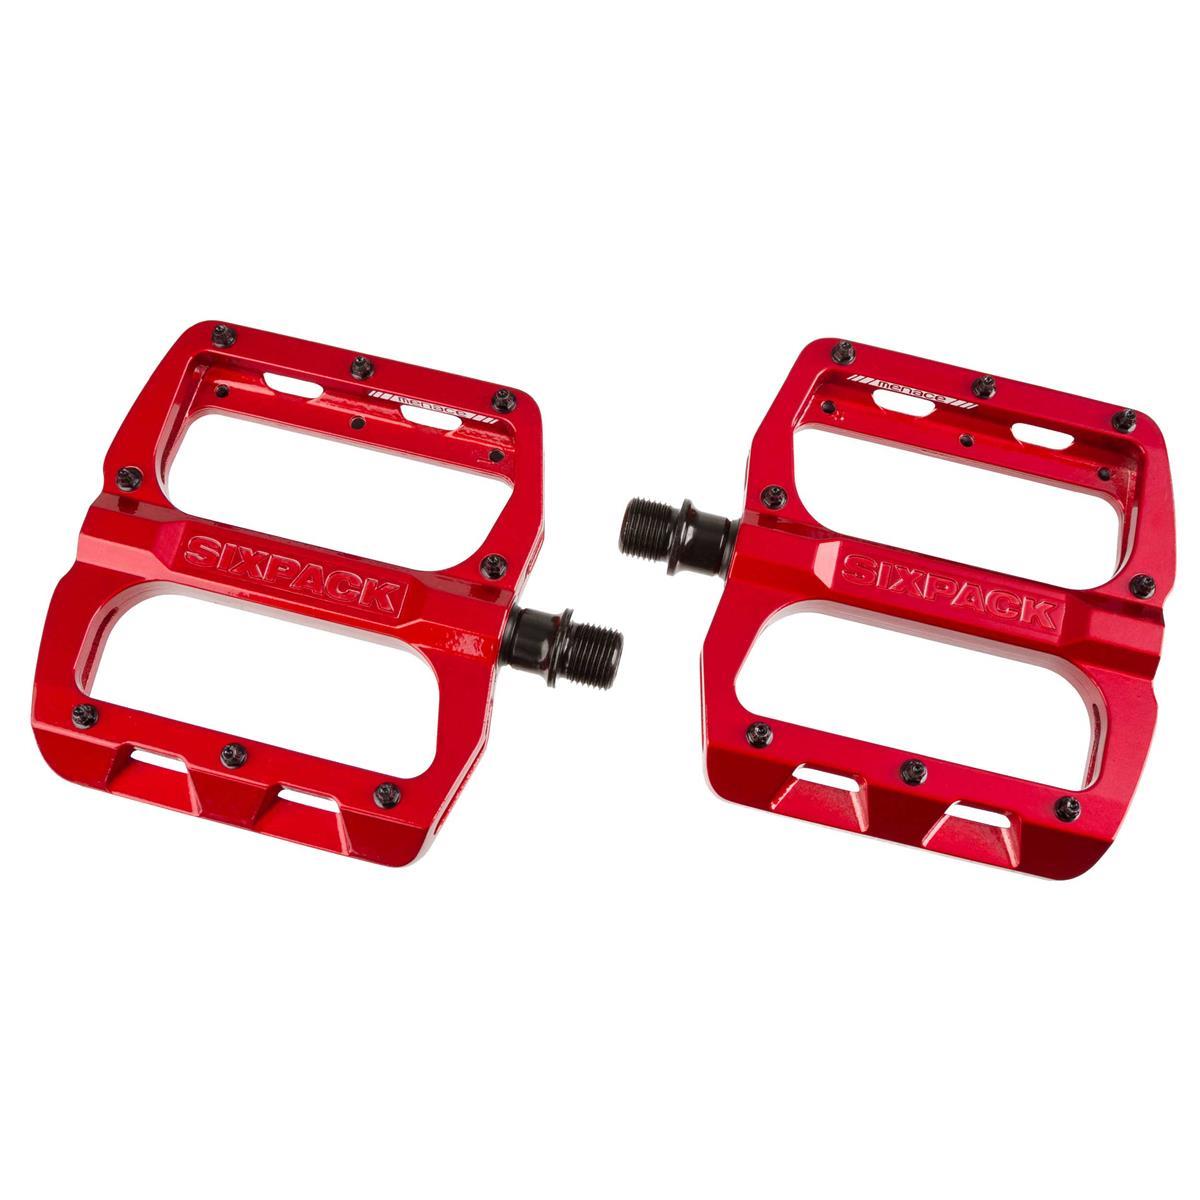 Sixpack Plattform-Pedal Menace Rot, 95x110 mm Plattform, 28 M4 Pins, 1 Paar